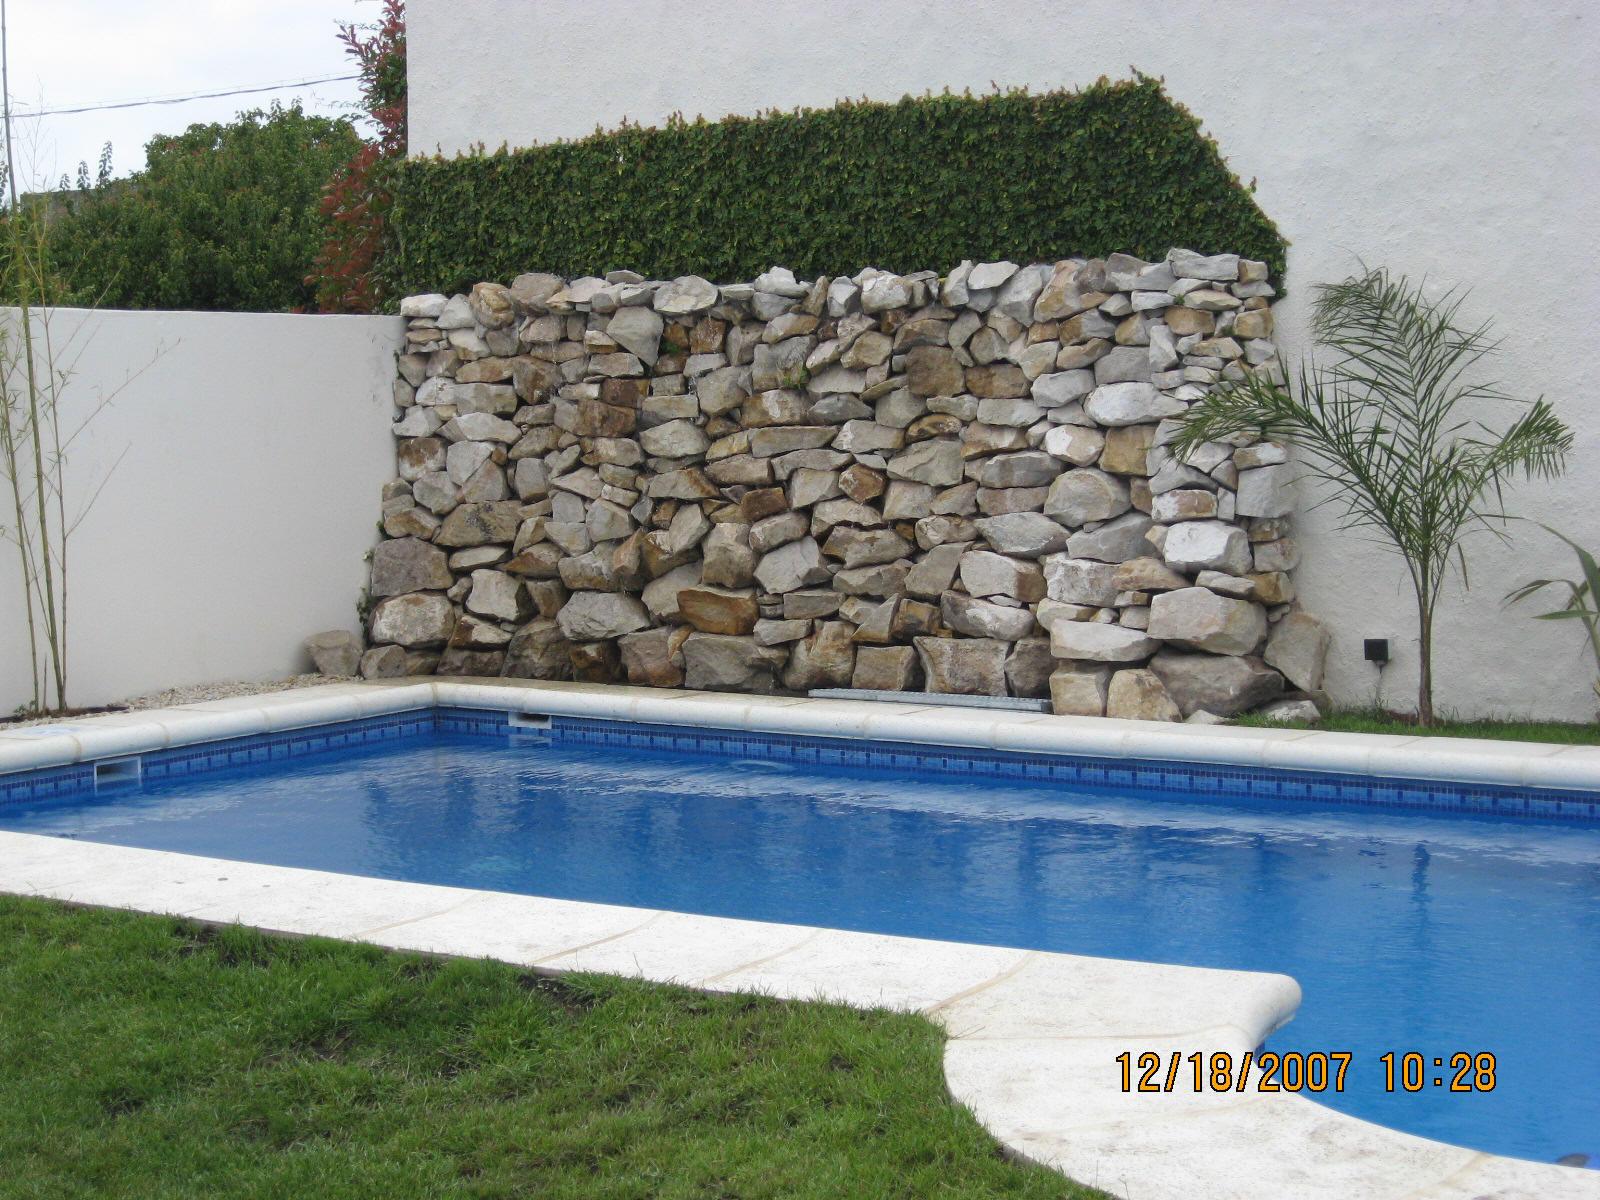 Pagina nueva 1 for Modelos de piscinas con cascadas